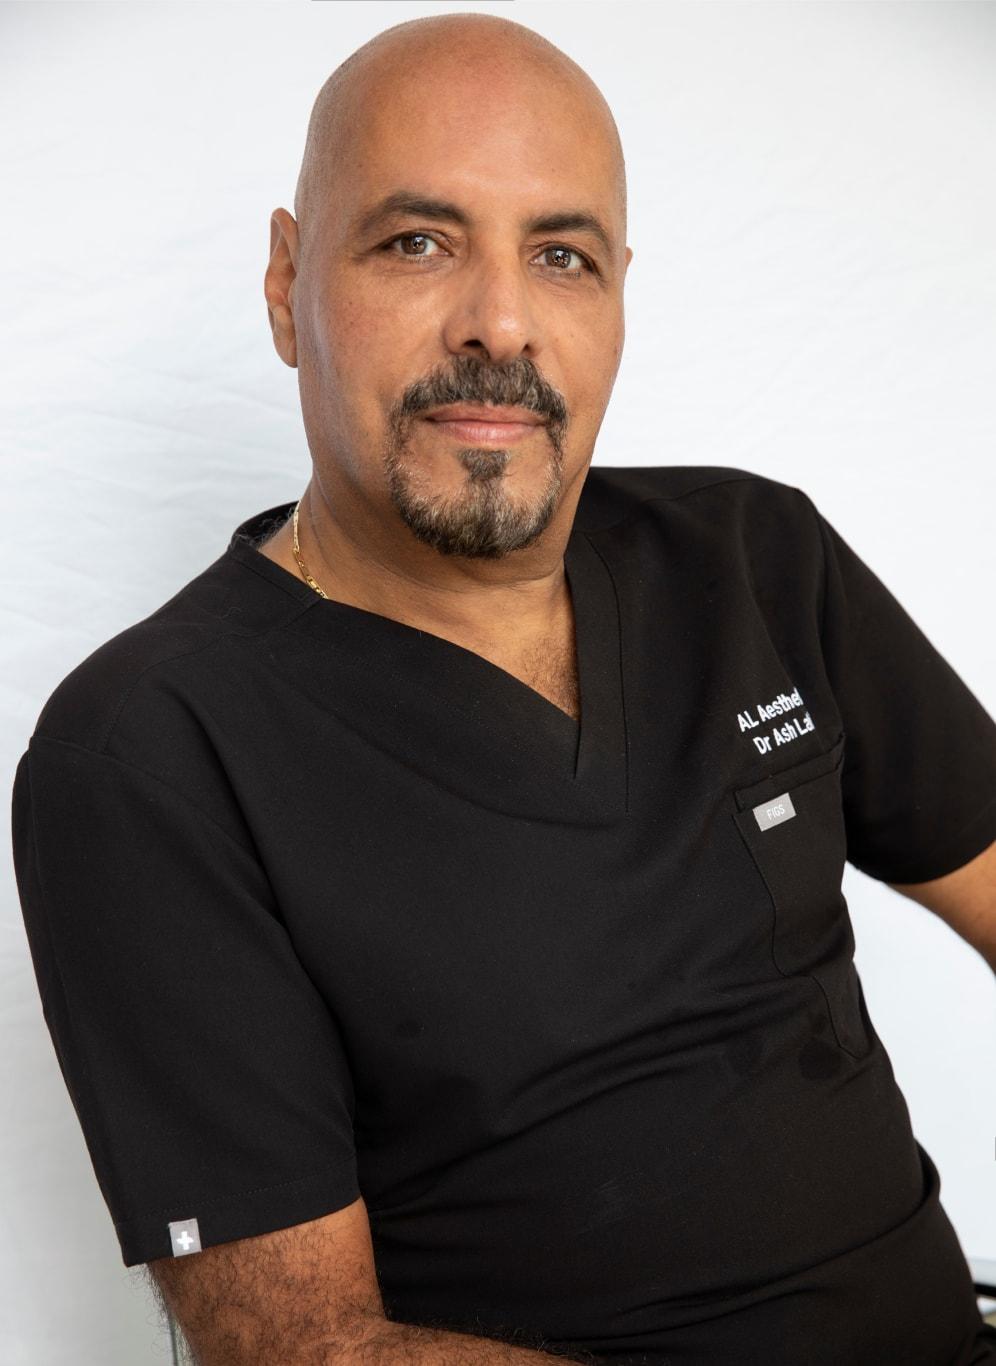 Dr Ash Labib trained aesthetics doctor